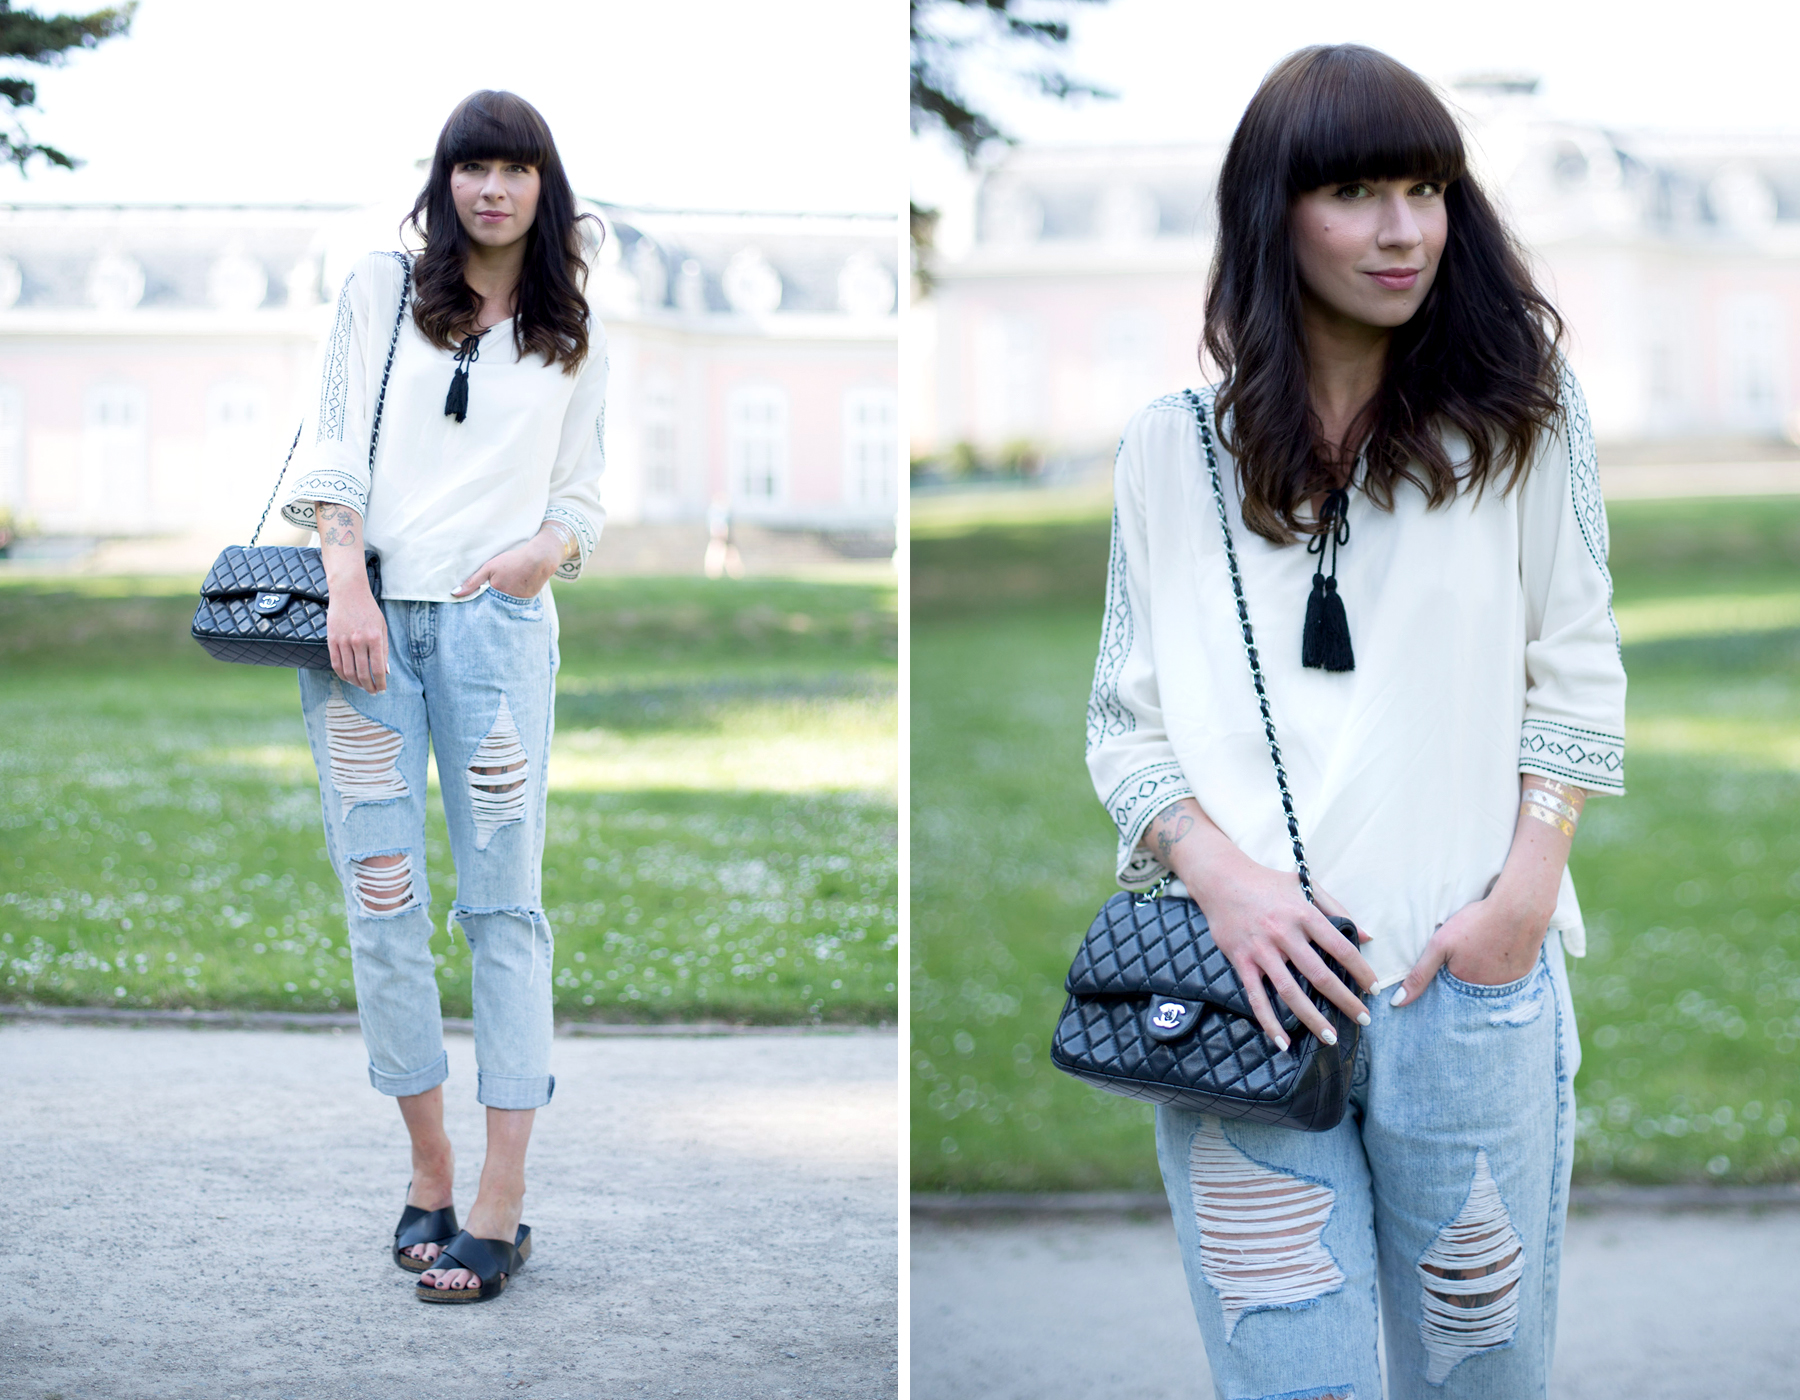 jeans girl ripped denim shopbop styling summer düsseldorf dusseldorf fashion blogger germany cats & dogs ricarda schernus 4